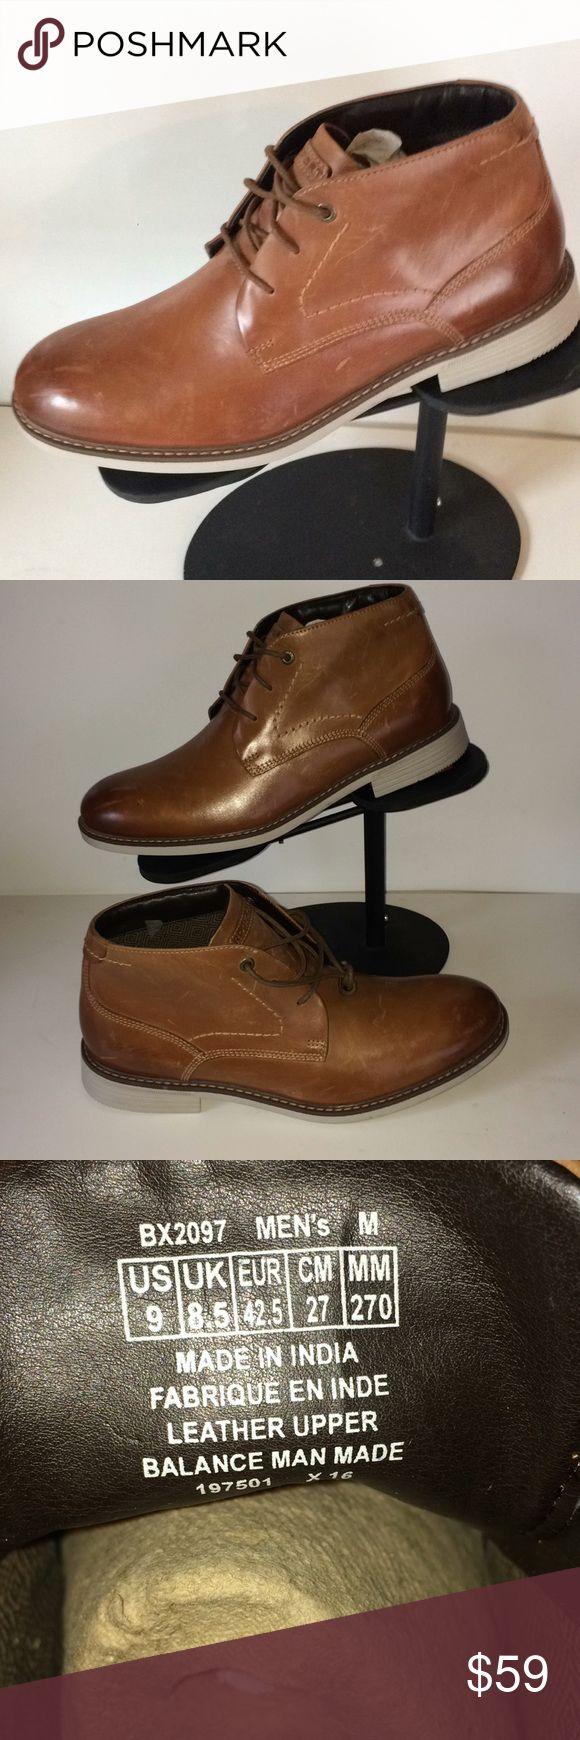 Rockport men's leather ankle boots sz 9 Rockport men's leather ankle boots sz 9 New with scratches from handling Rockport Shoes Chukka Boots